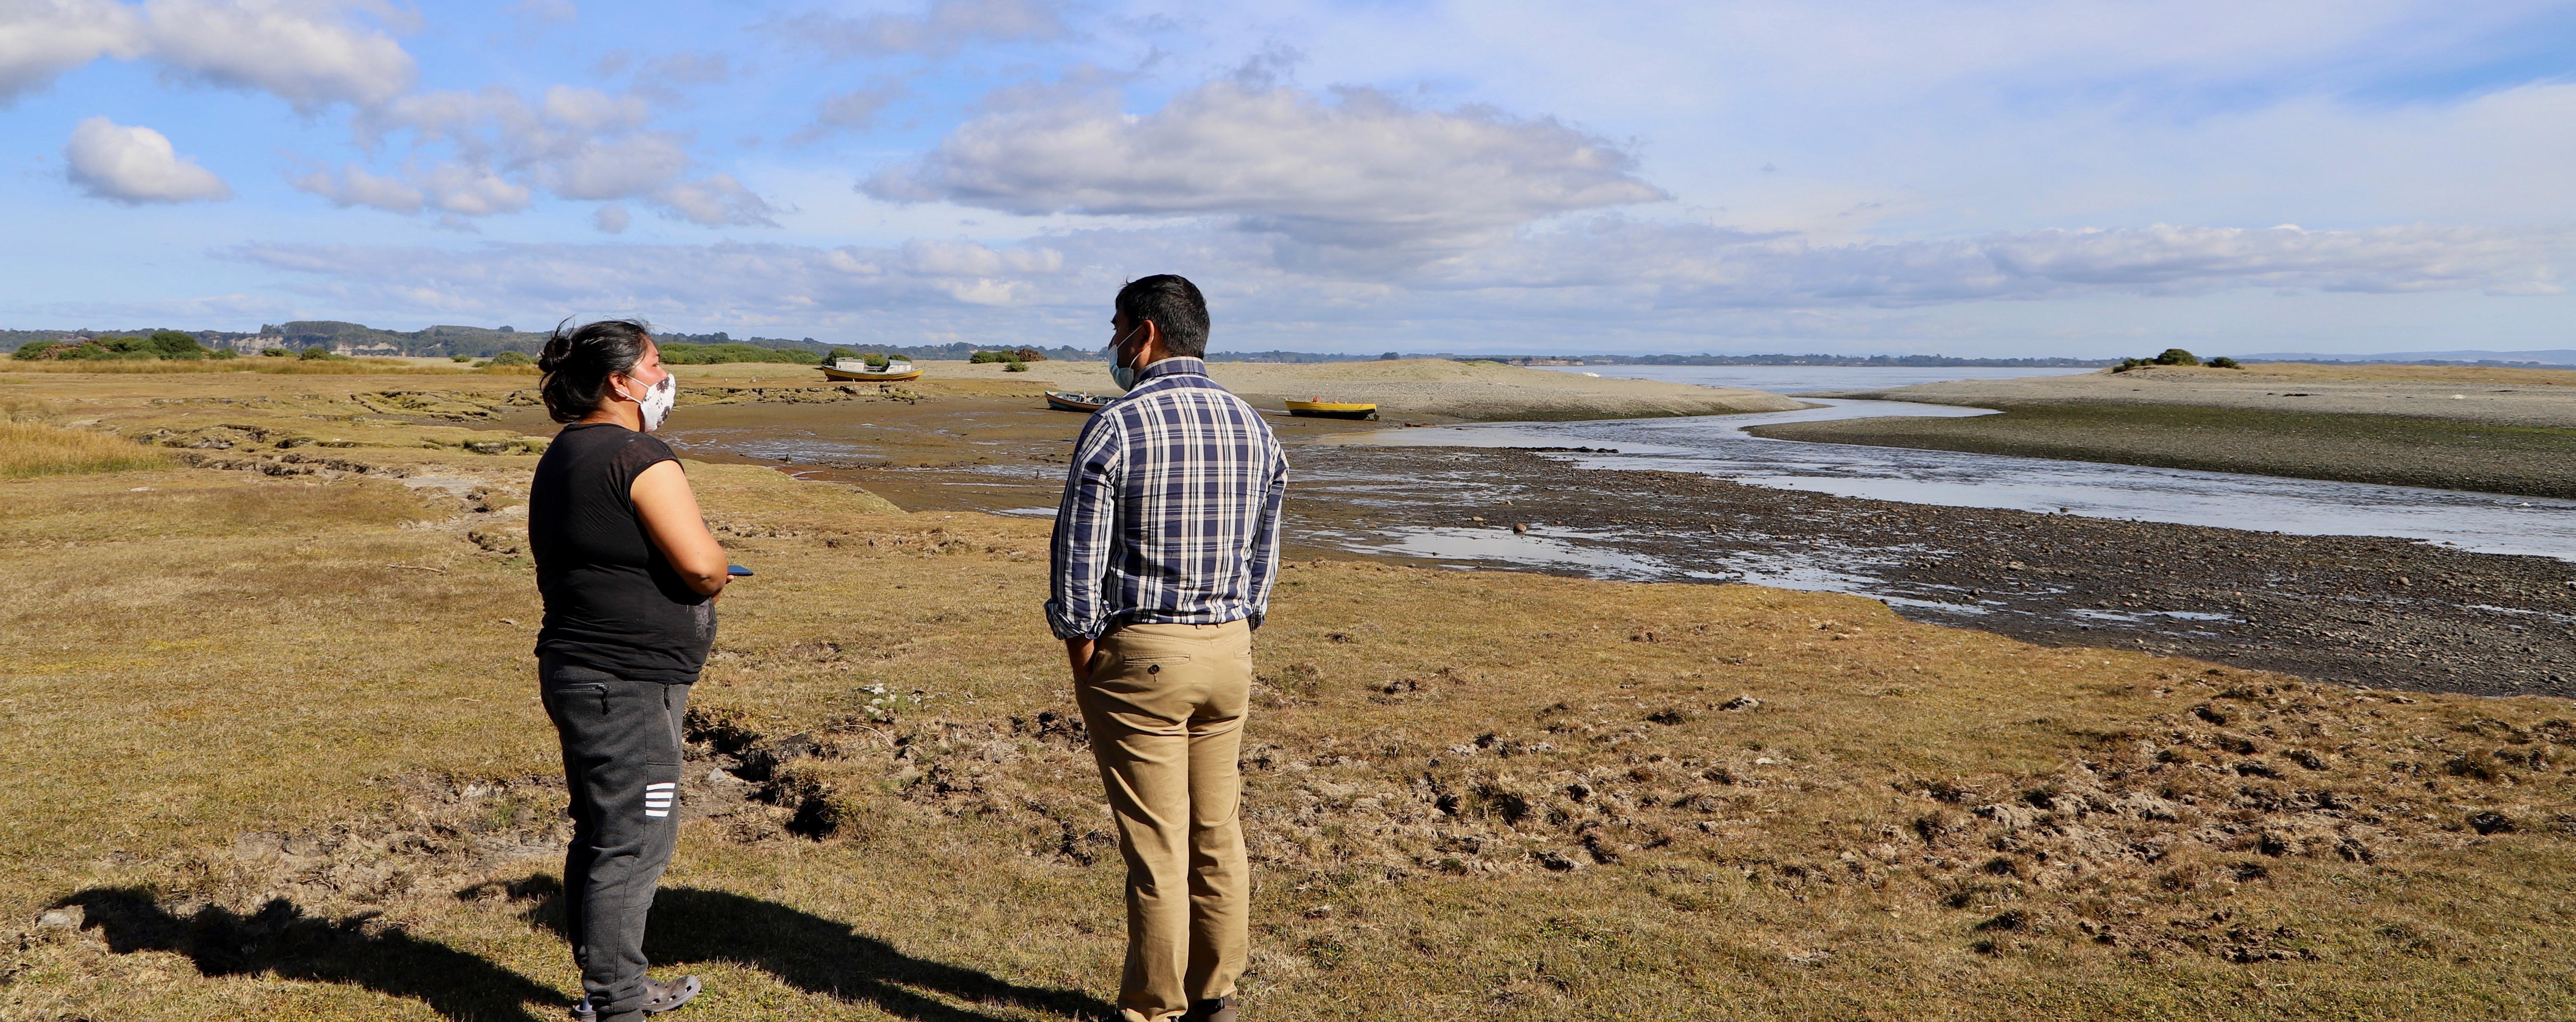 Indigenous community members of Carelmapu monitoring Ainco beach